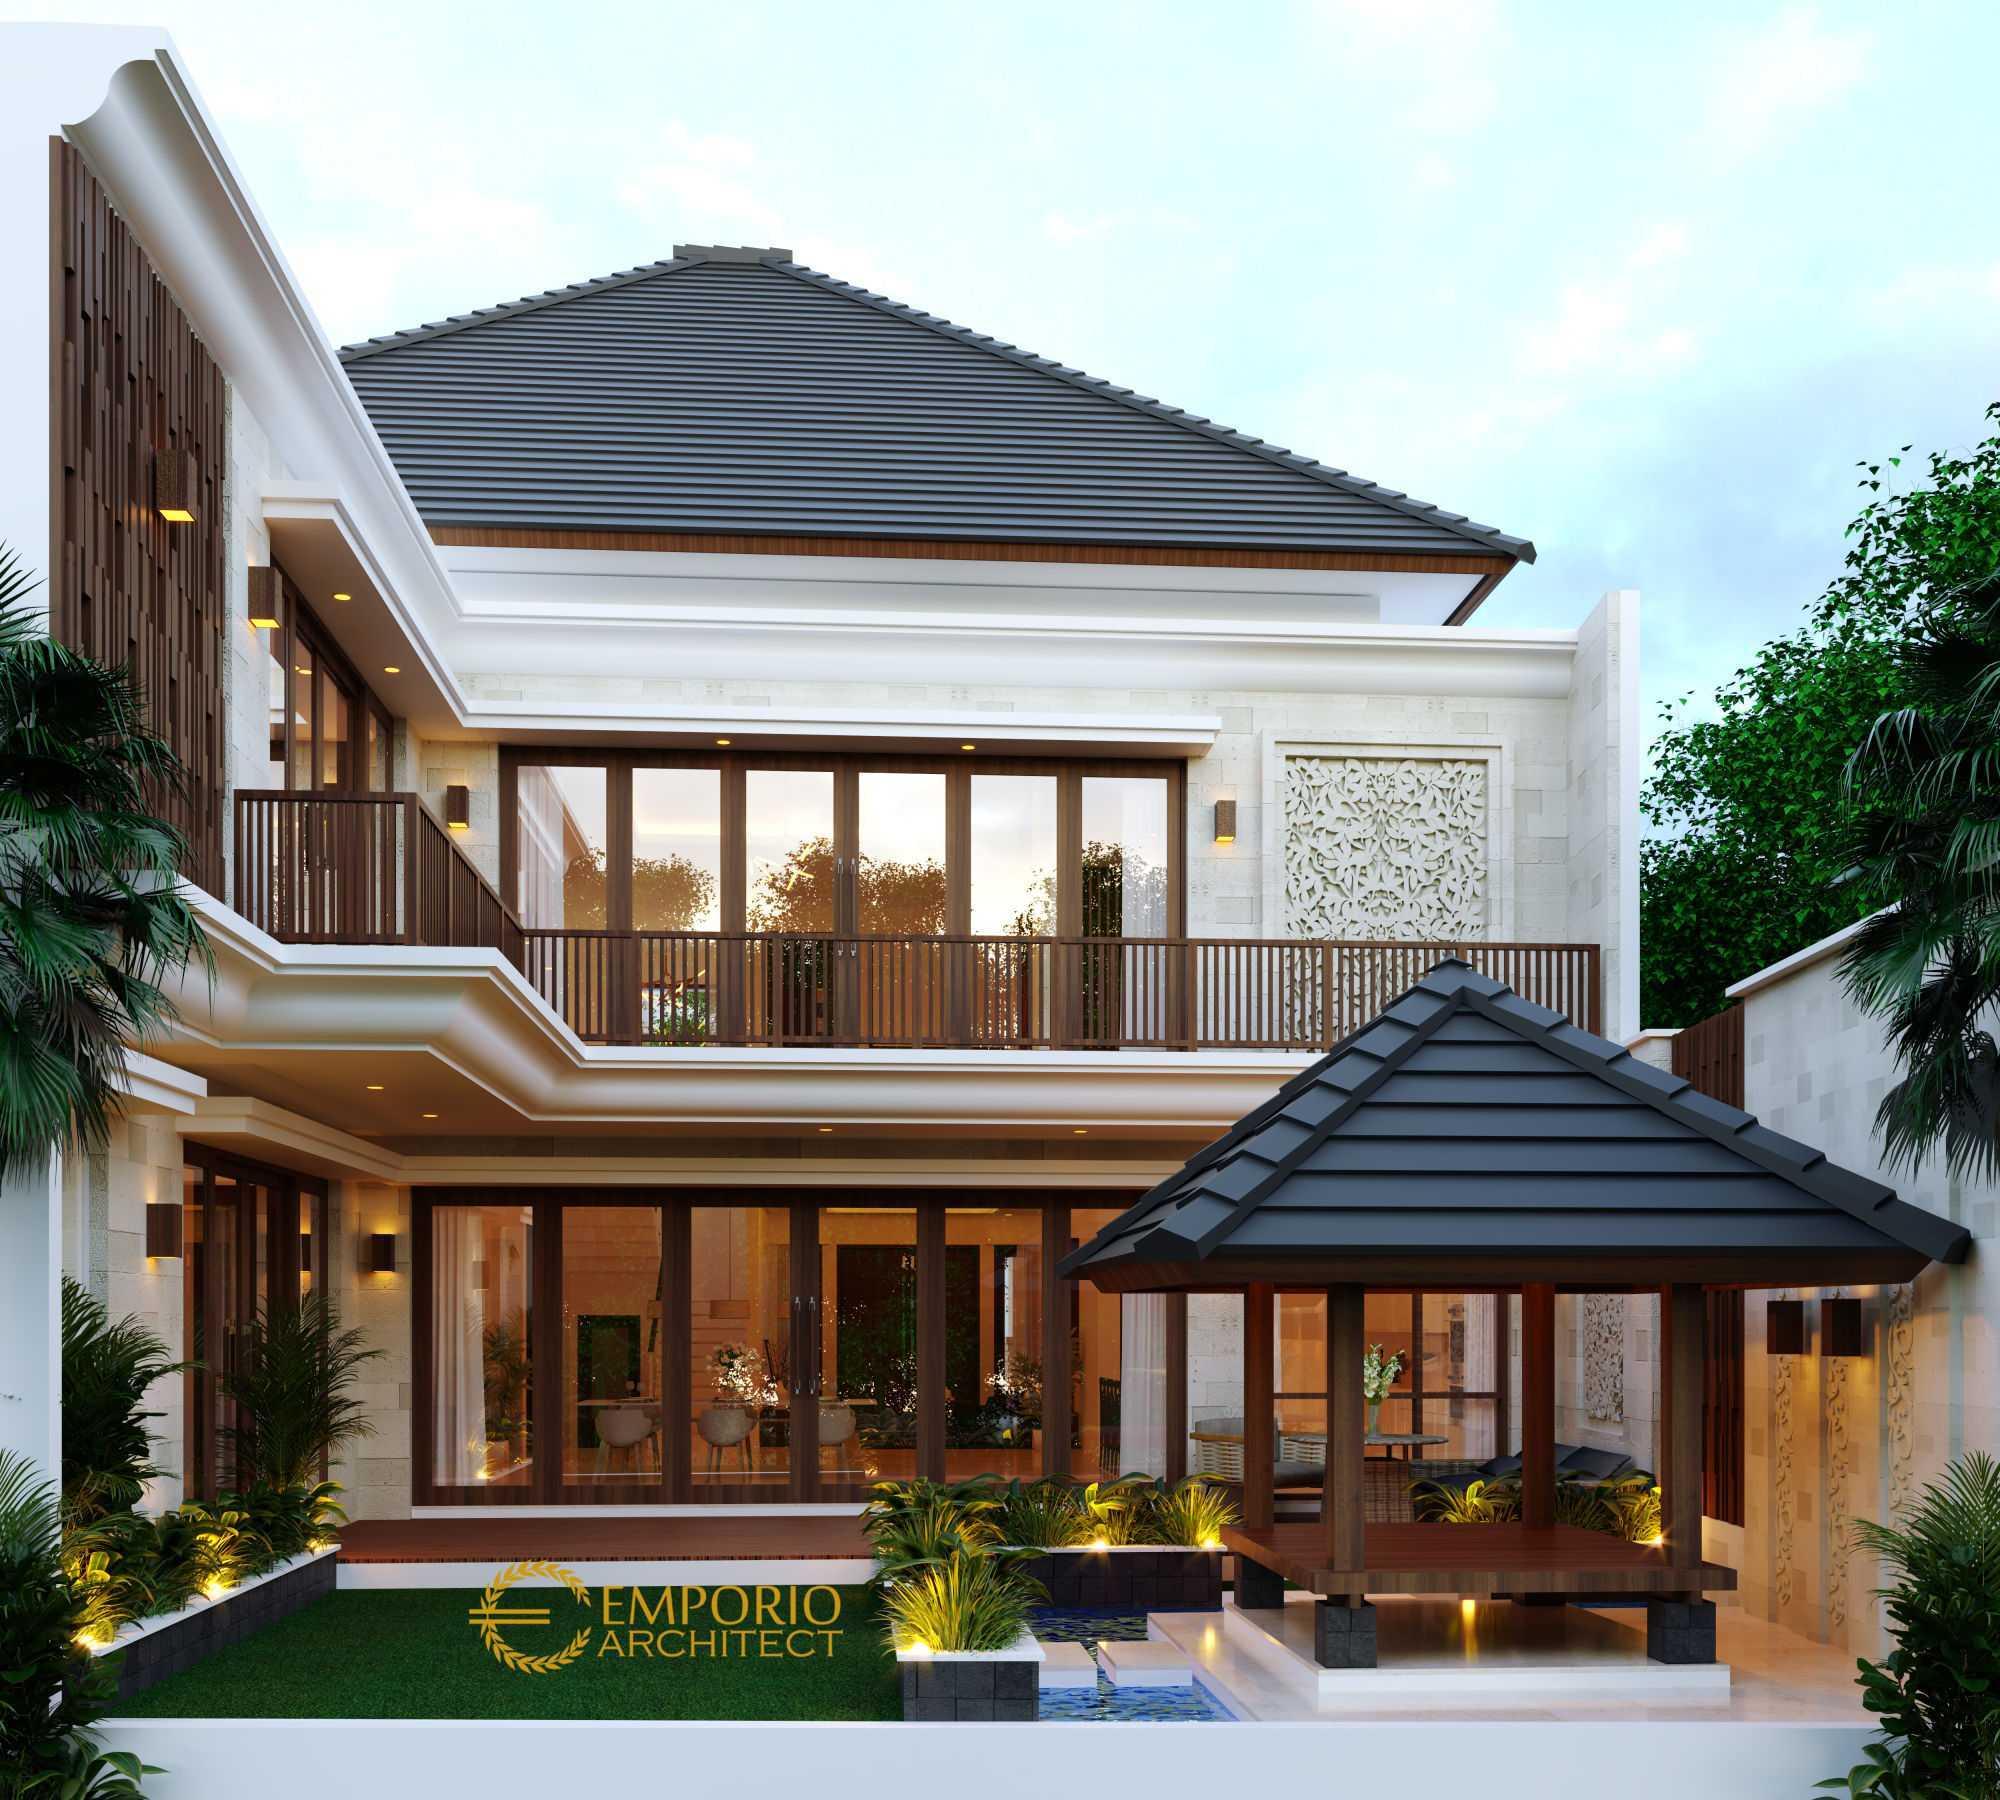 Emporio Architect Jasa Arsitek Makassar Desain Rumah Villa Bali Tropis 683 @ Makassar Makassar, Kota Makassar, Sulawesi Selatan, Indonesia Makassar, Kota Makassar, Sulawesi Selatan, Indonesia Emporio-Architect-Jasa-Arsitek-Makassar-Desain-Rumah-Villa-Bali-Tropis-683-Makassar  81774